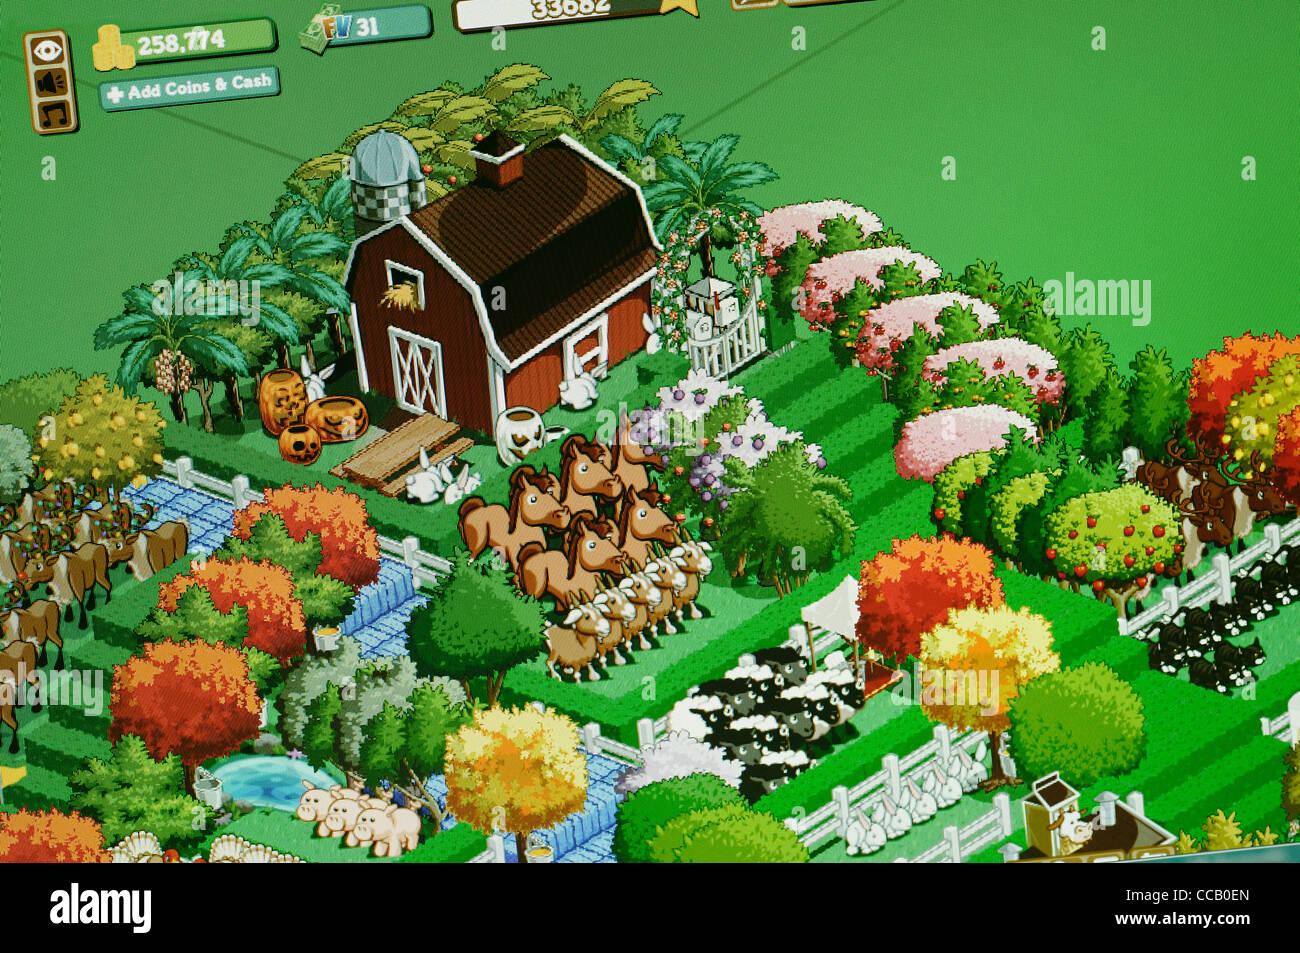 Farmville Screenshot. The Farming Simulation Social Network Game by Zynga. - Stock Image